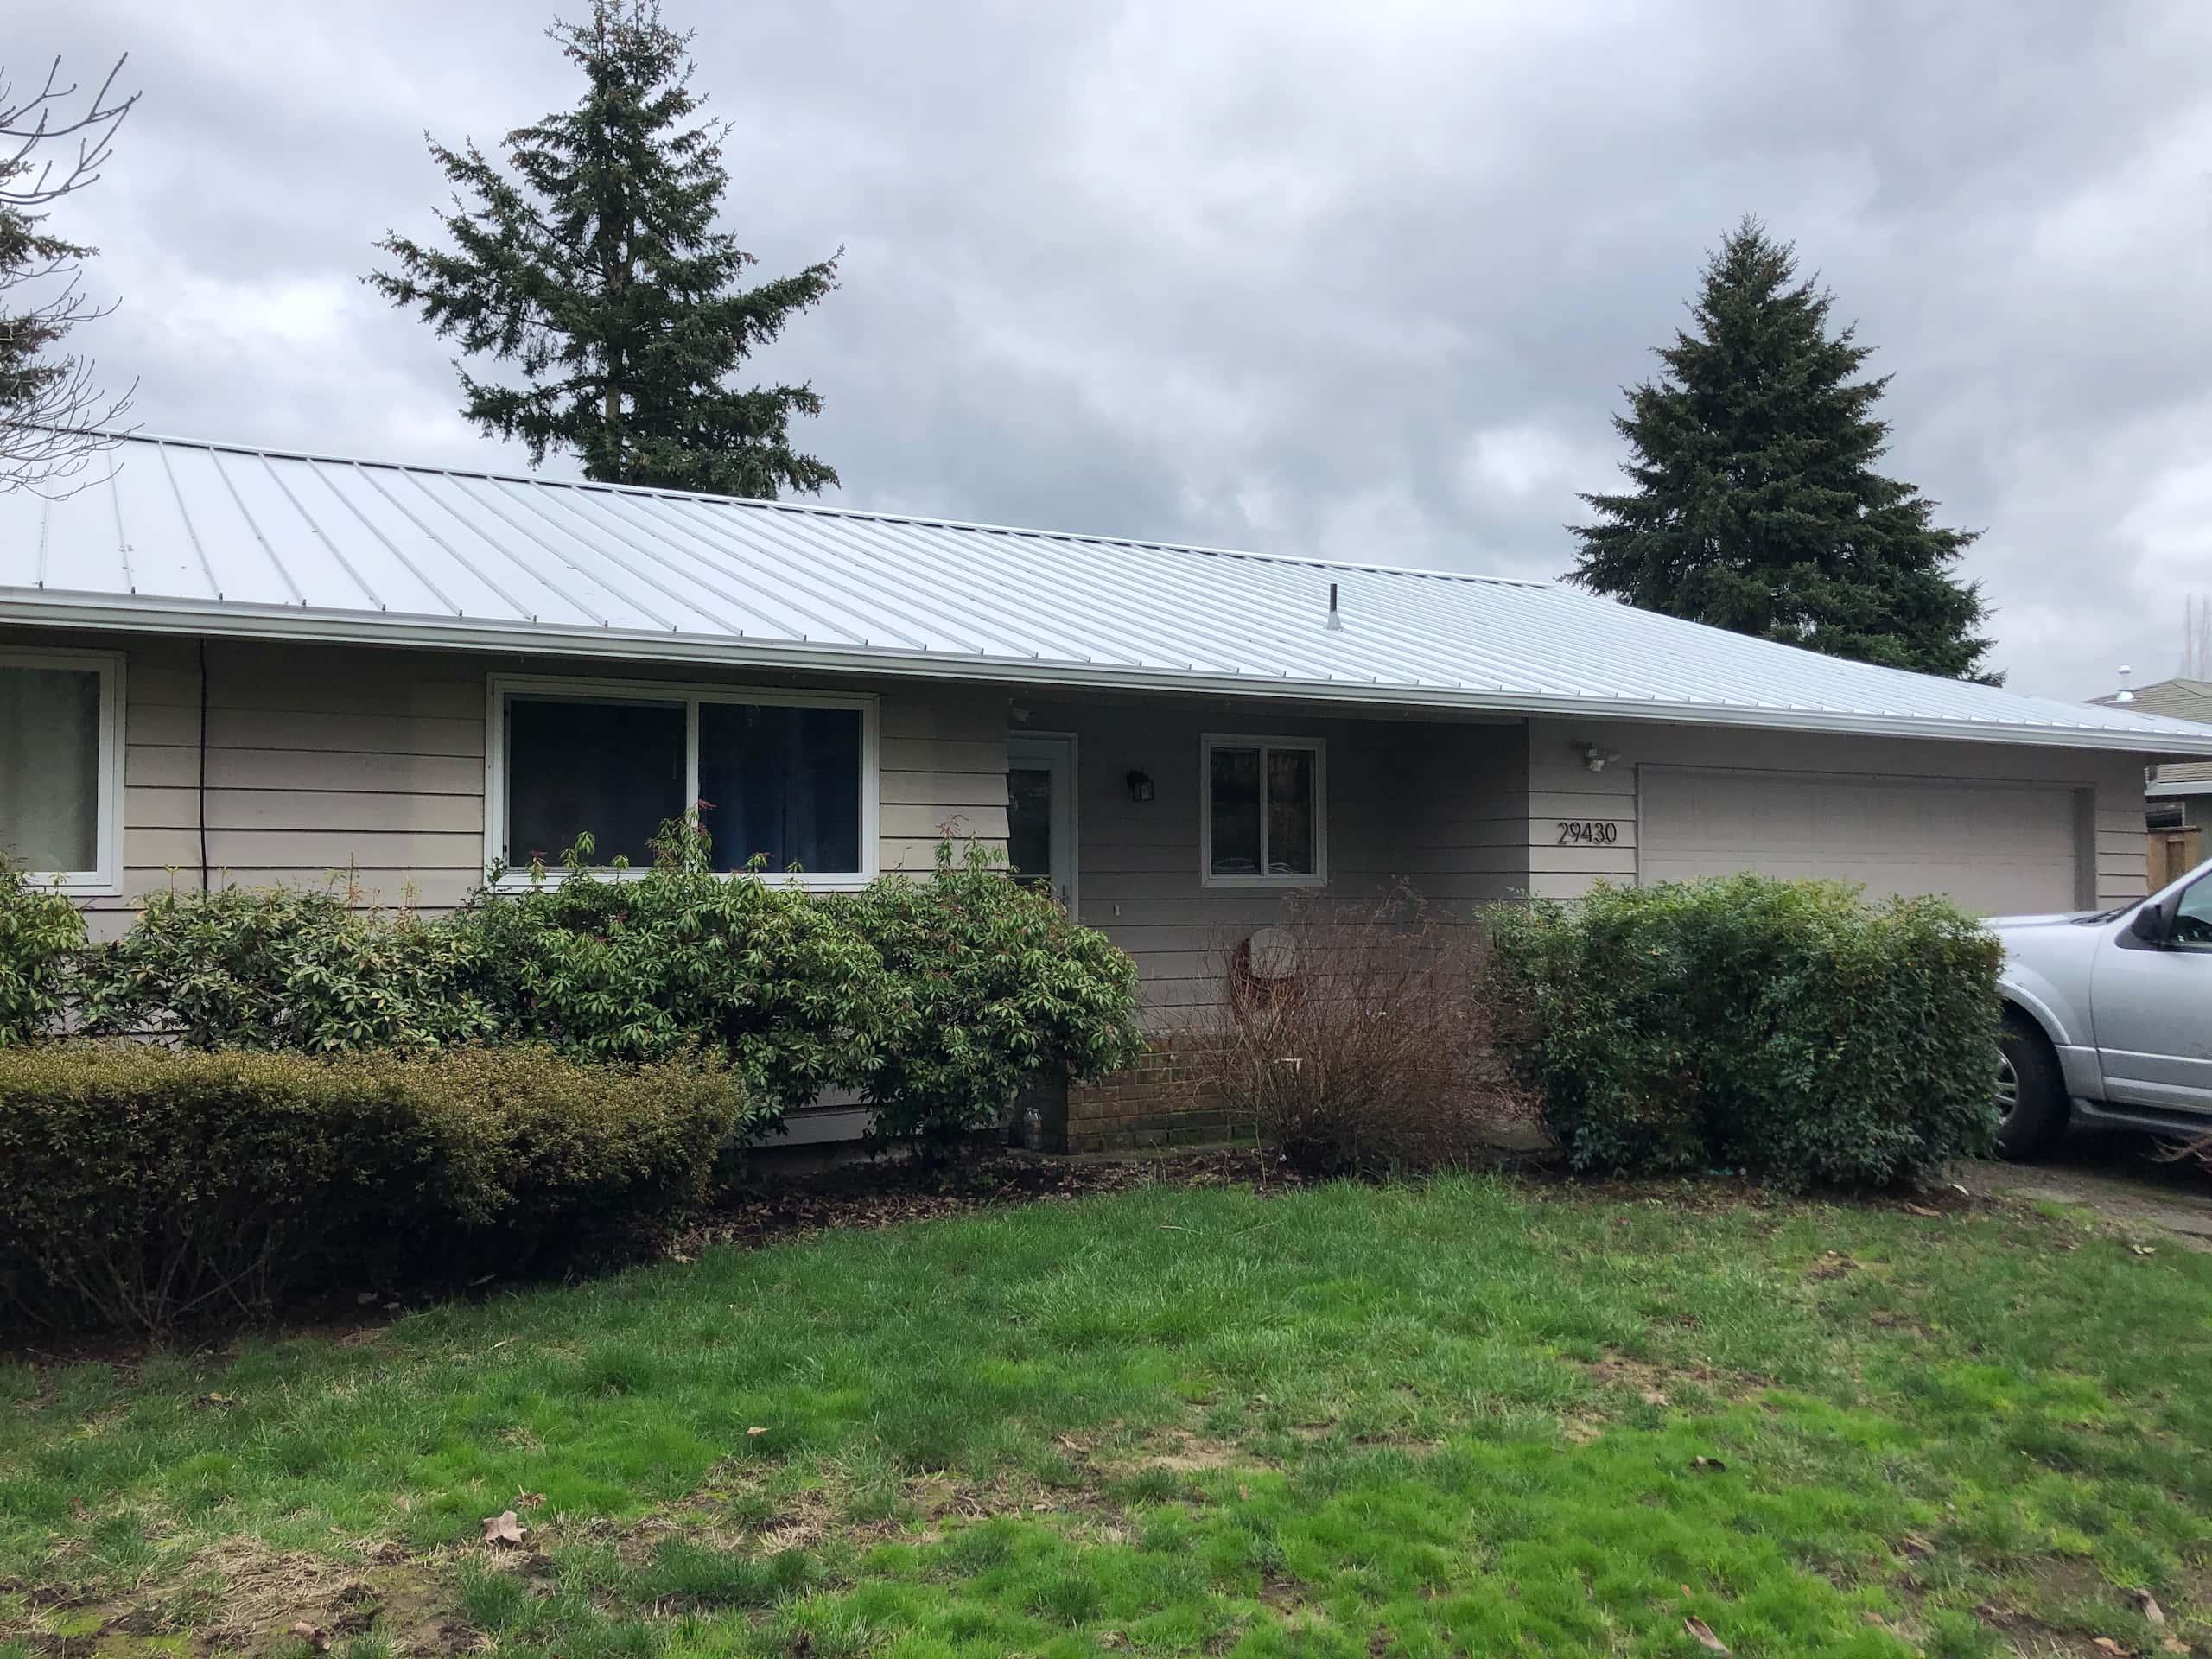 Reliance Roof Pros LLC | Beaverton | New Roof | Taylor Metal 24 Gauge Kynar | Glacier White | Front